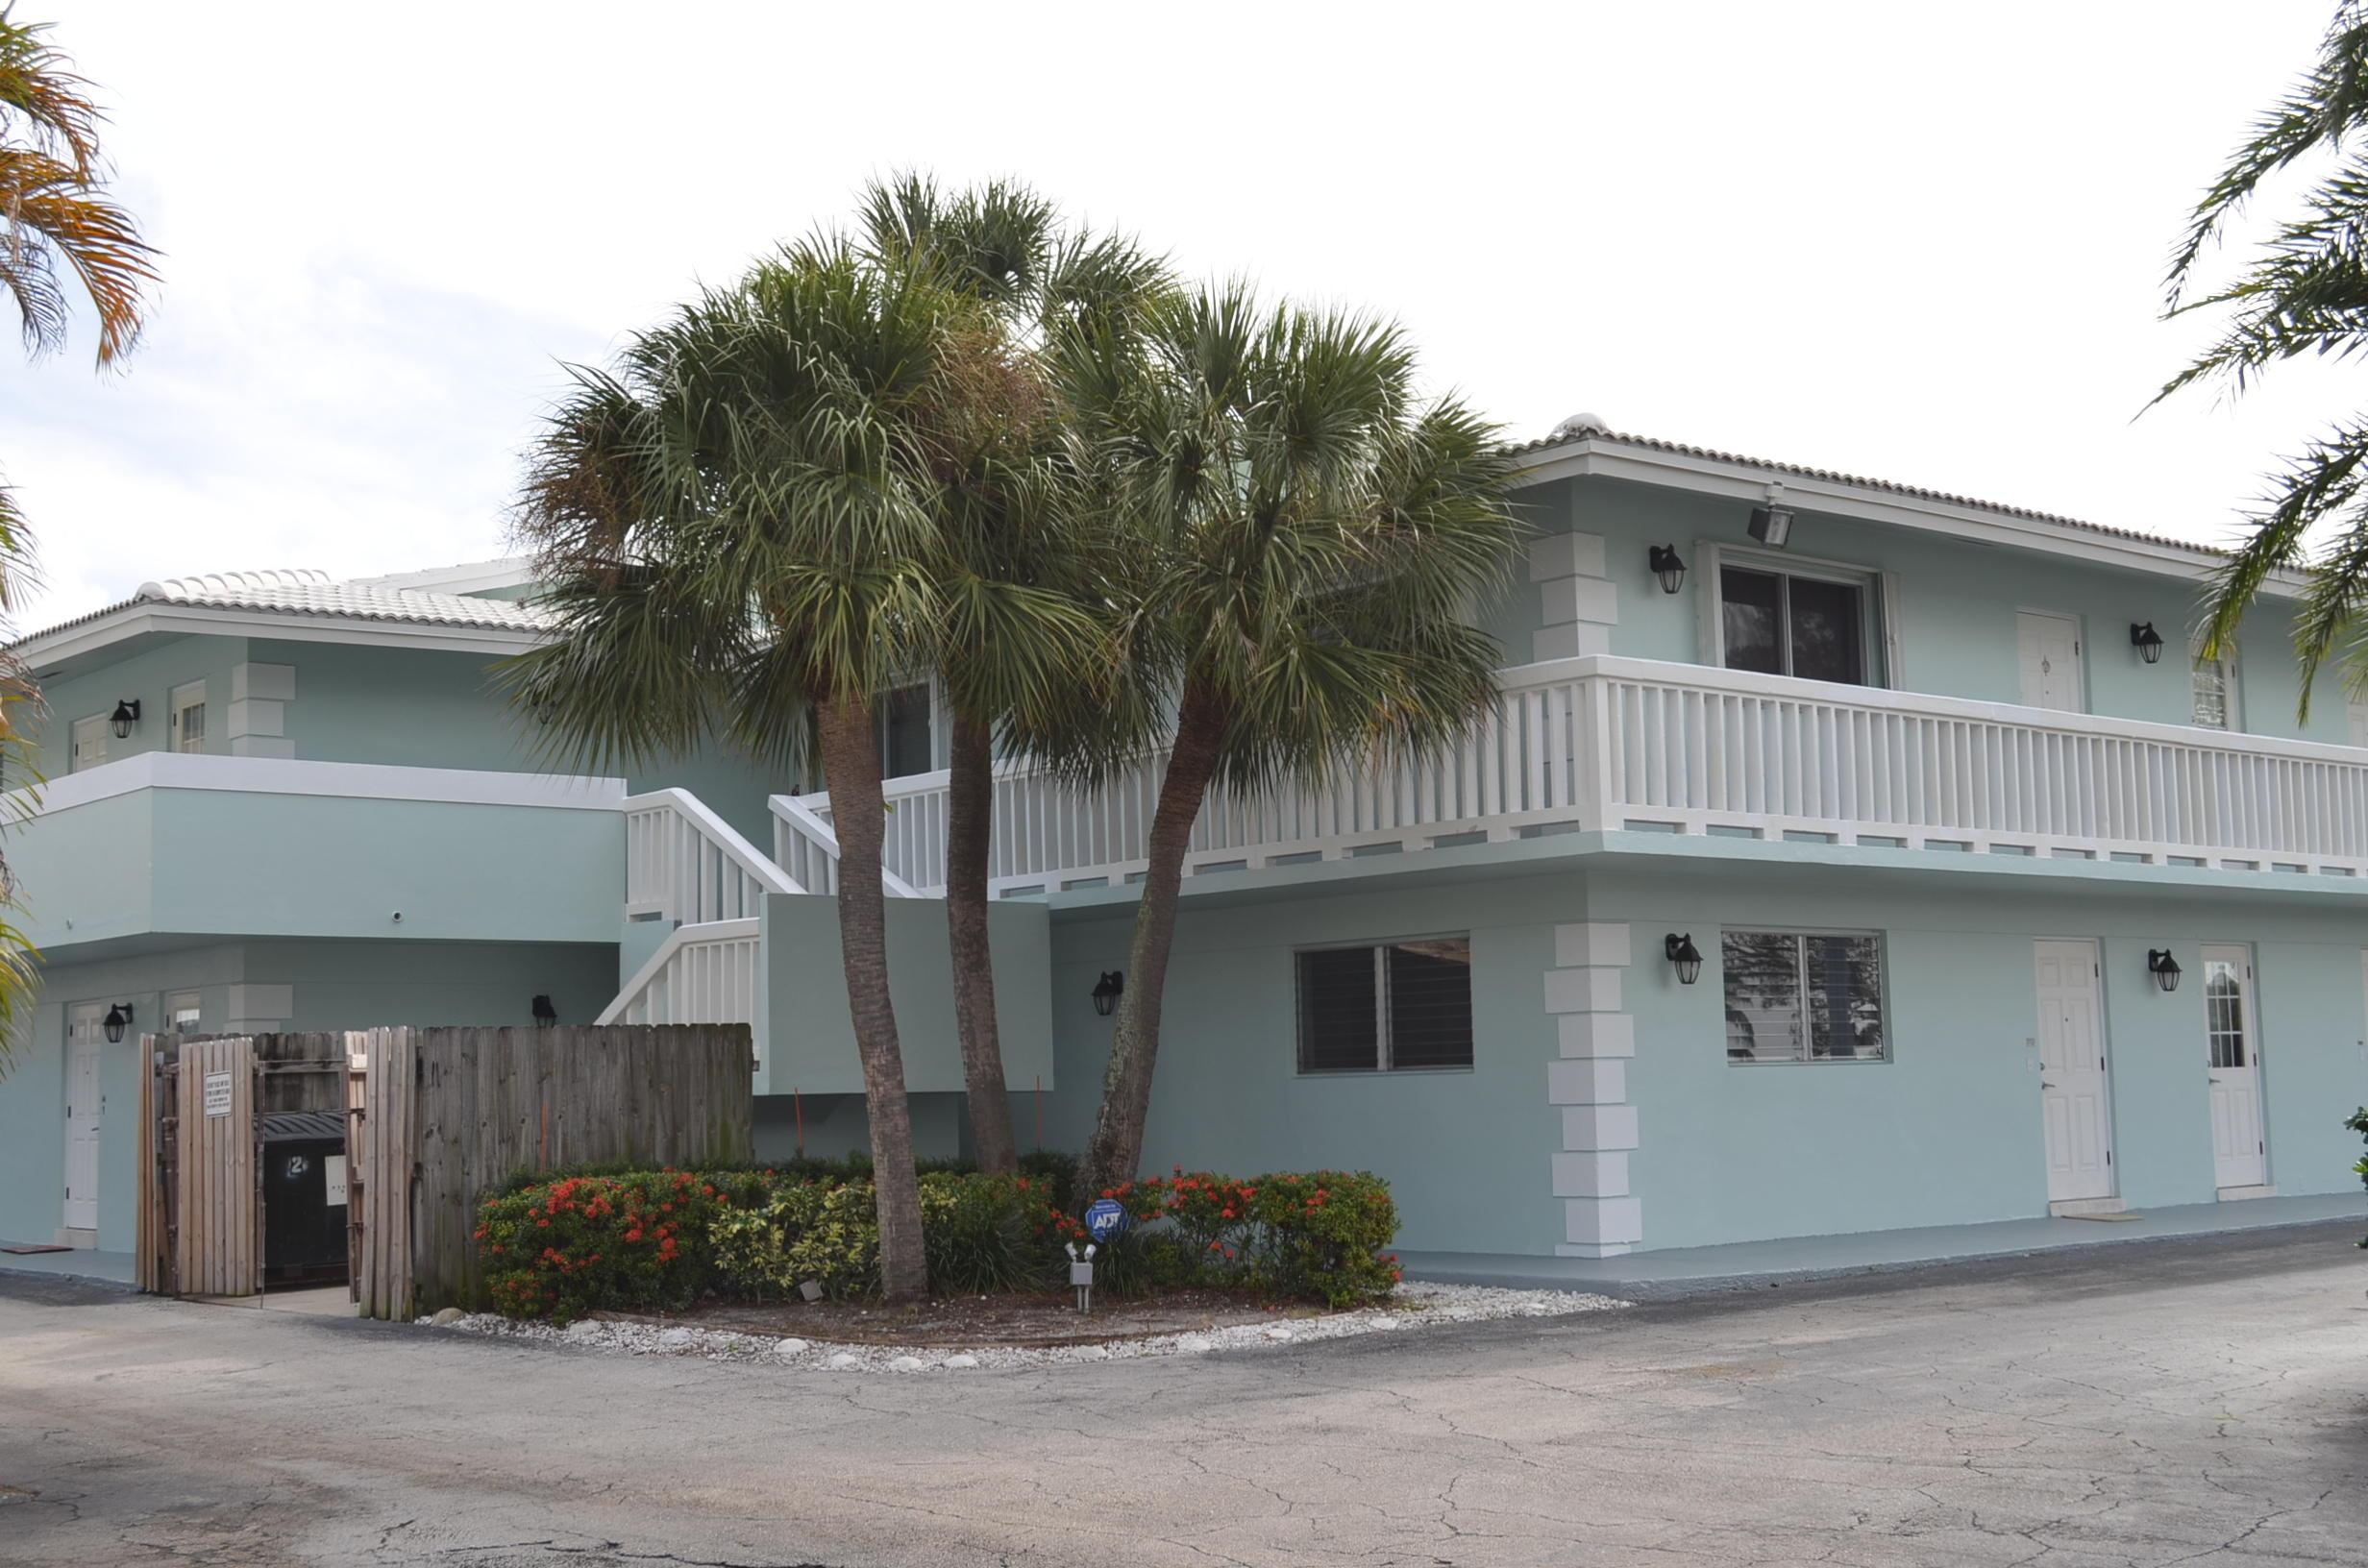 Photo of home for sale at 322 Federal Highway N, Deerfield Beach FL